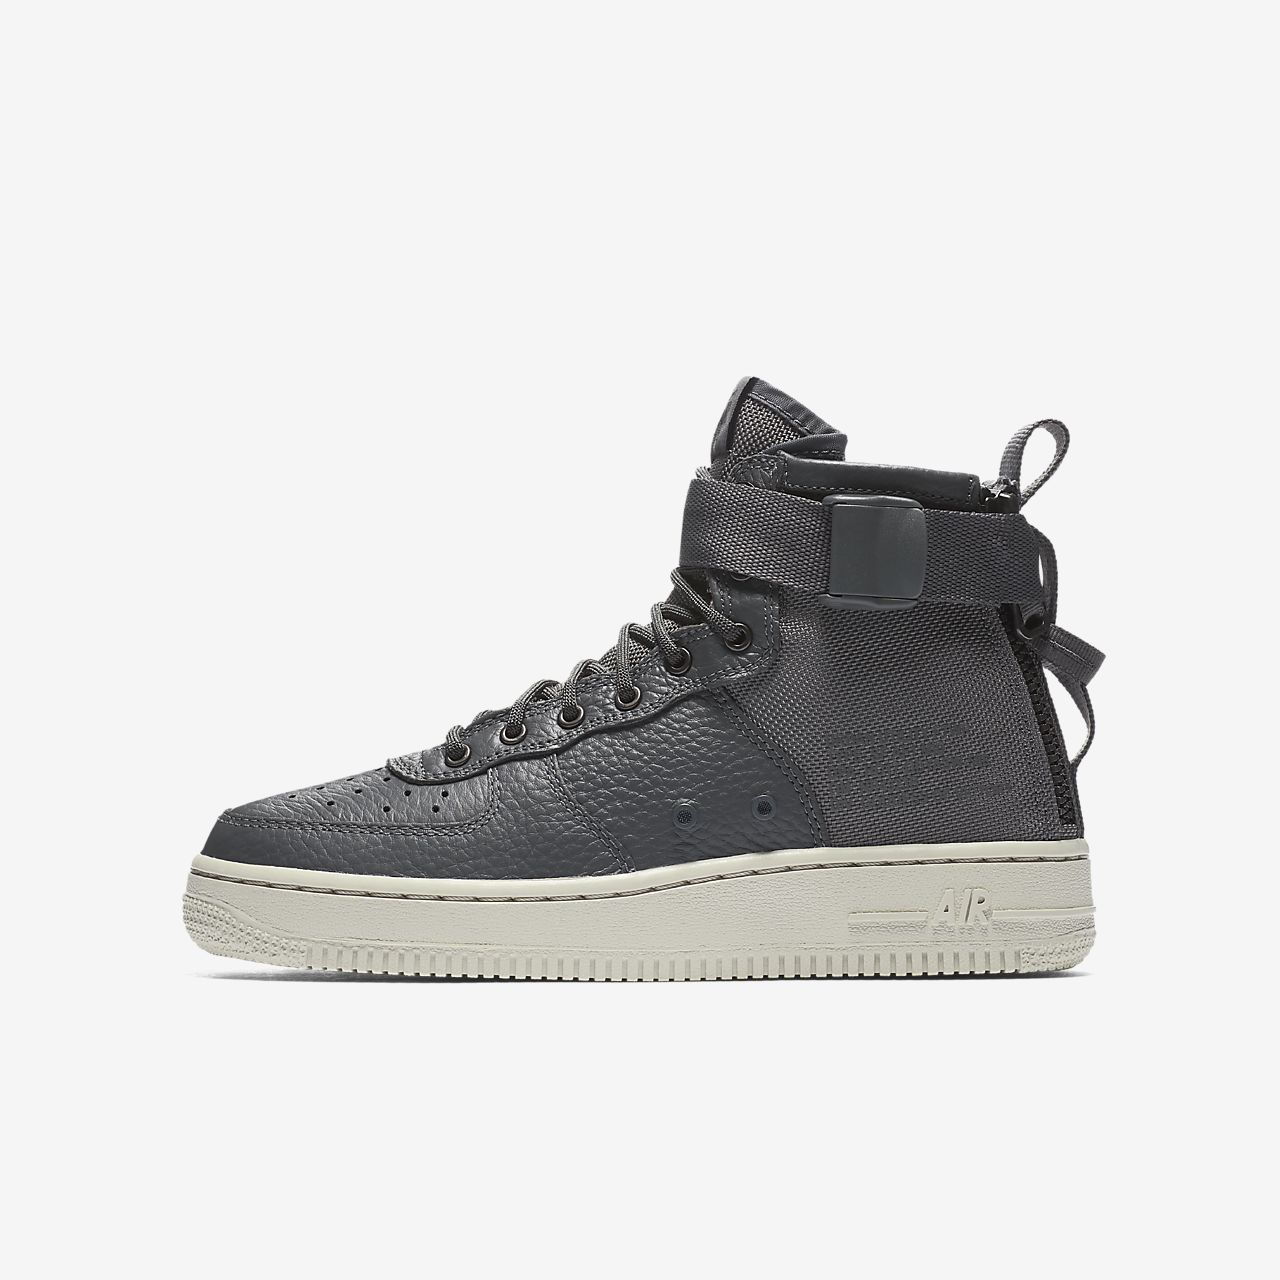 Nike SF Air Force 1 Mid Big Kids' Shoe